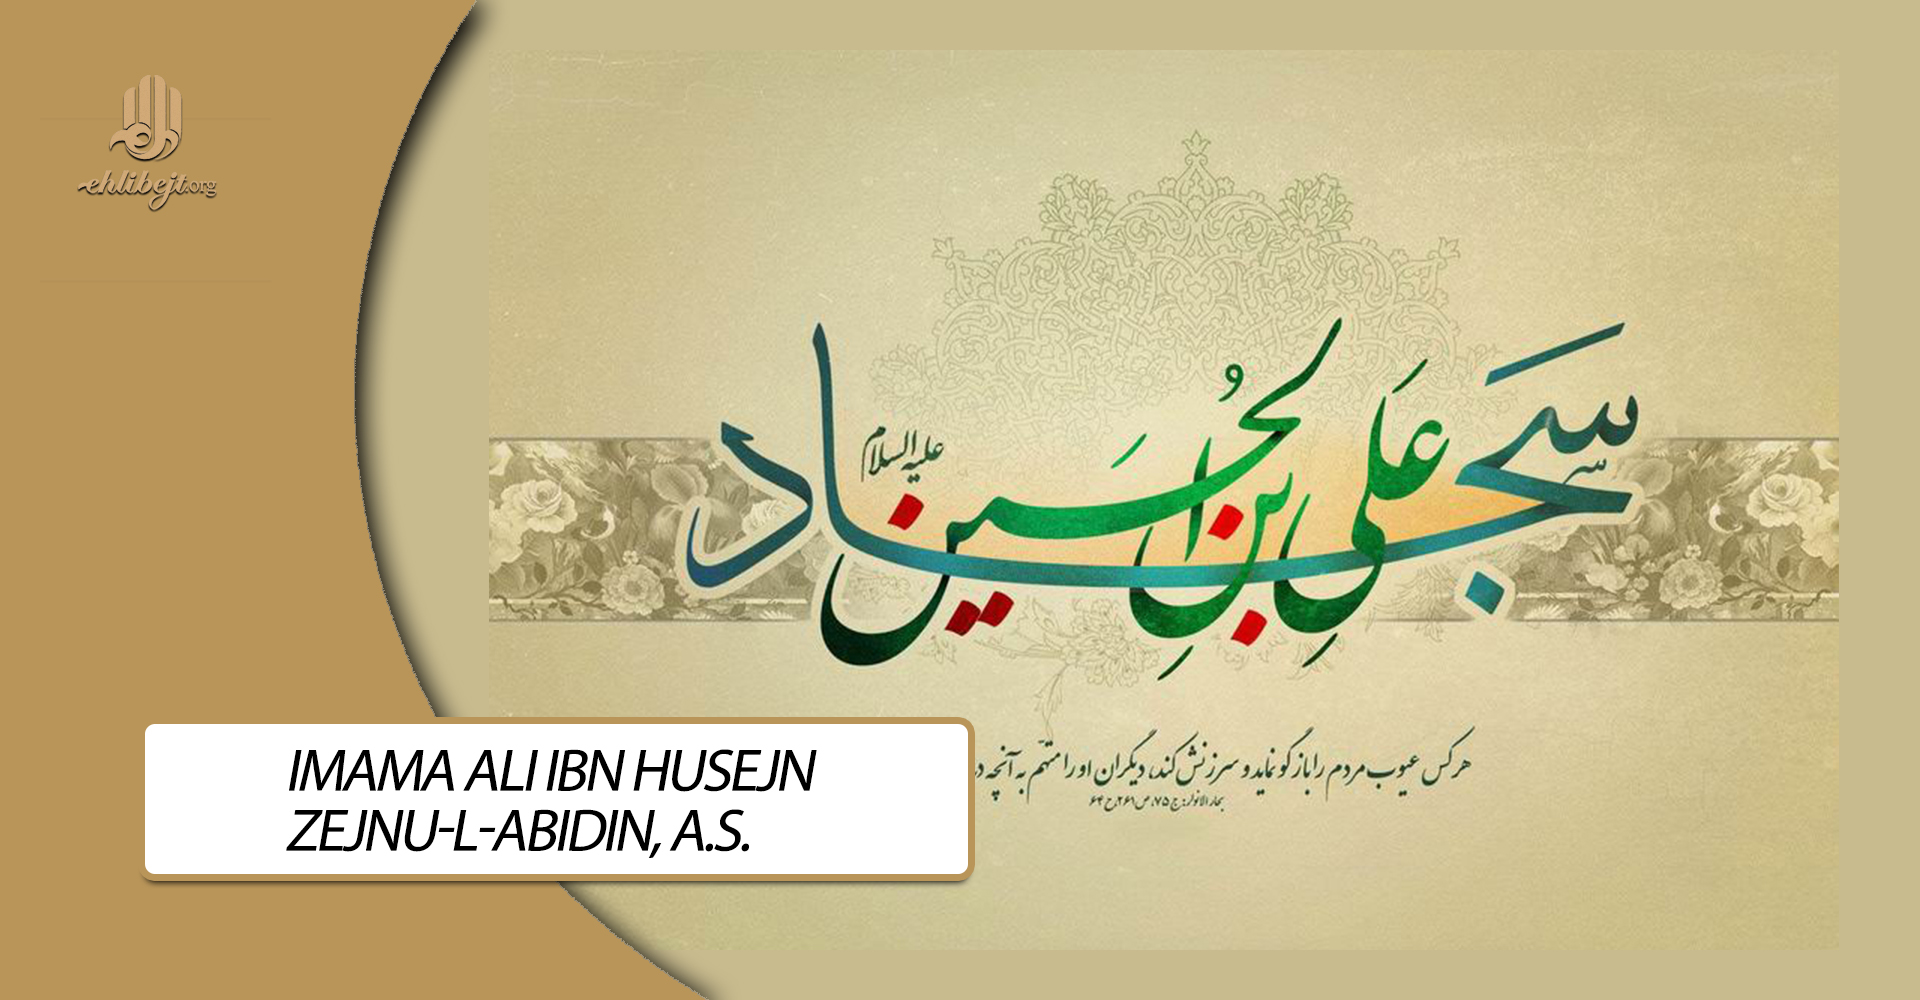 Imama Ali ibn Husejn Zejnu-l-Abidin, a.s.